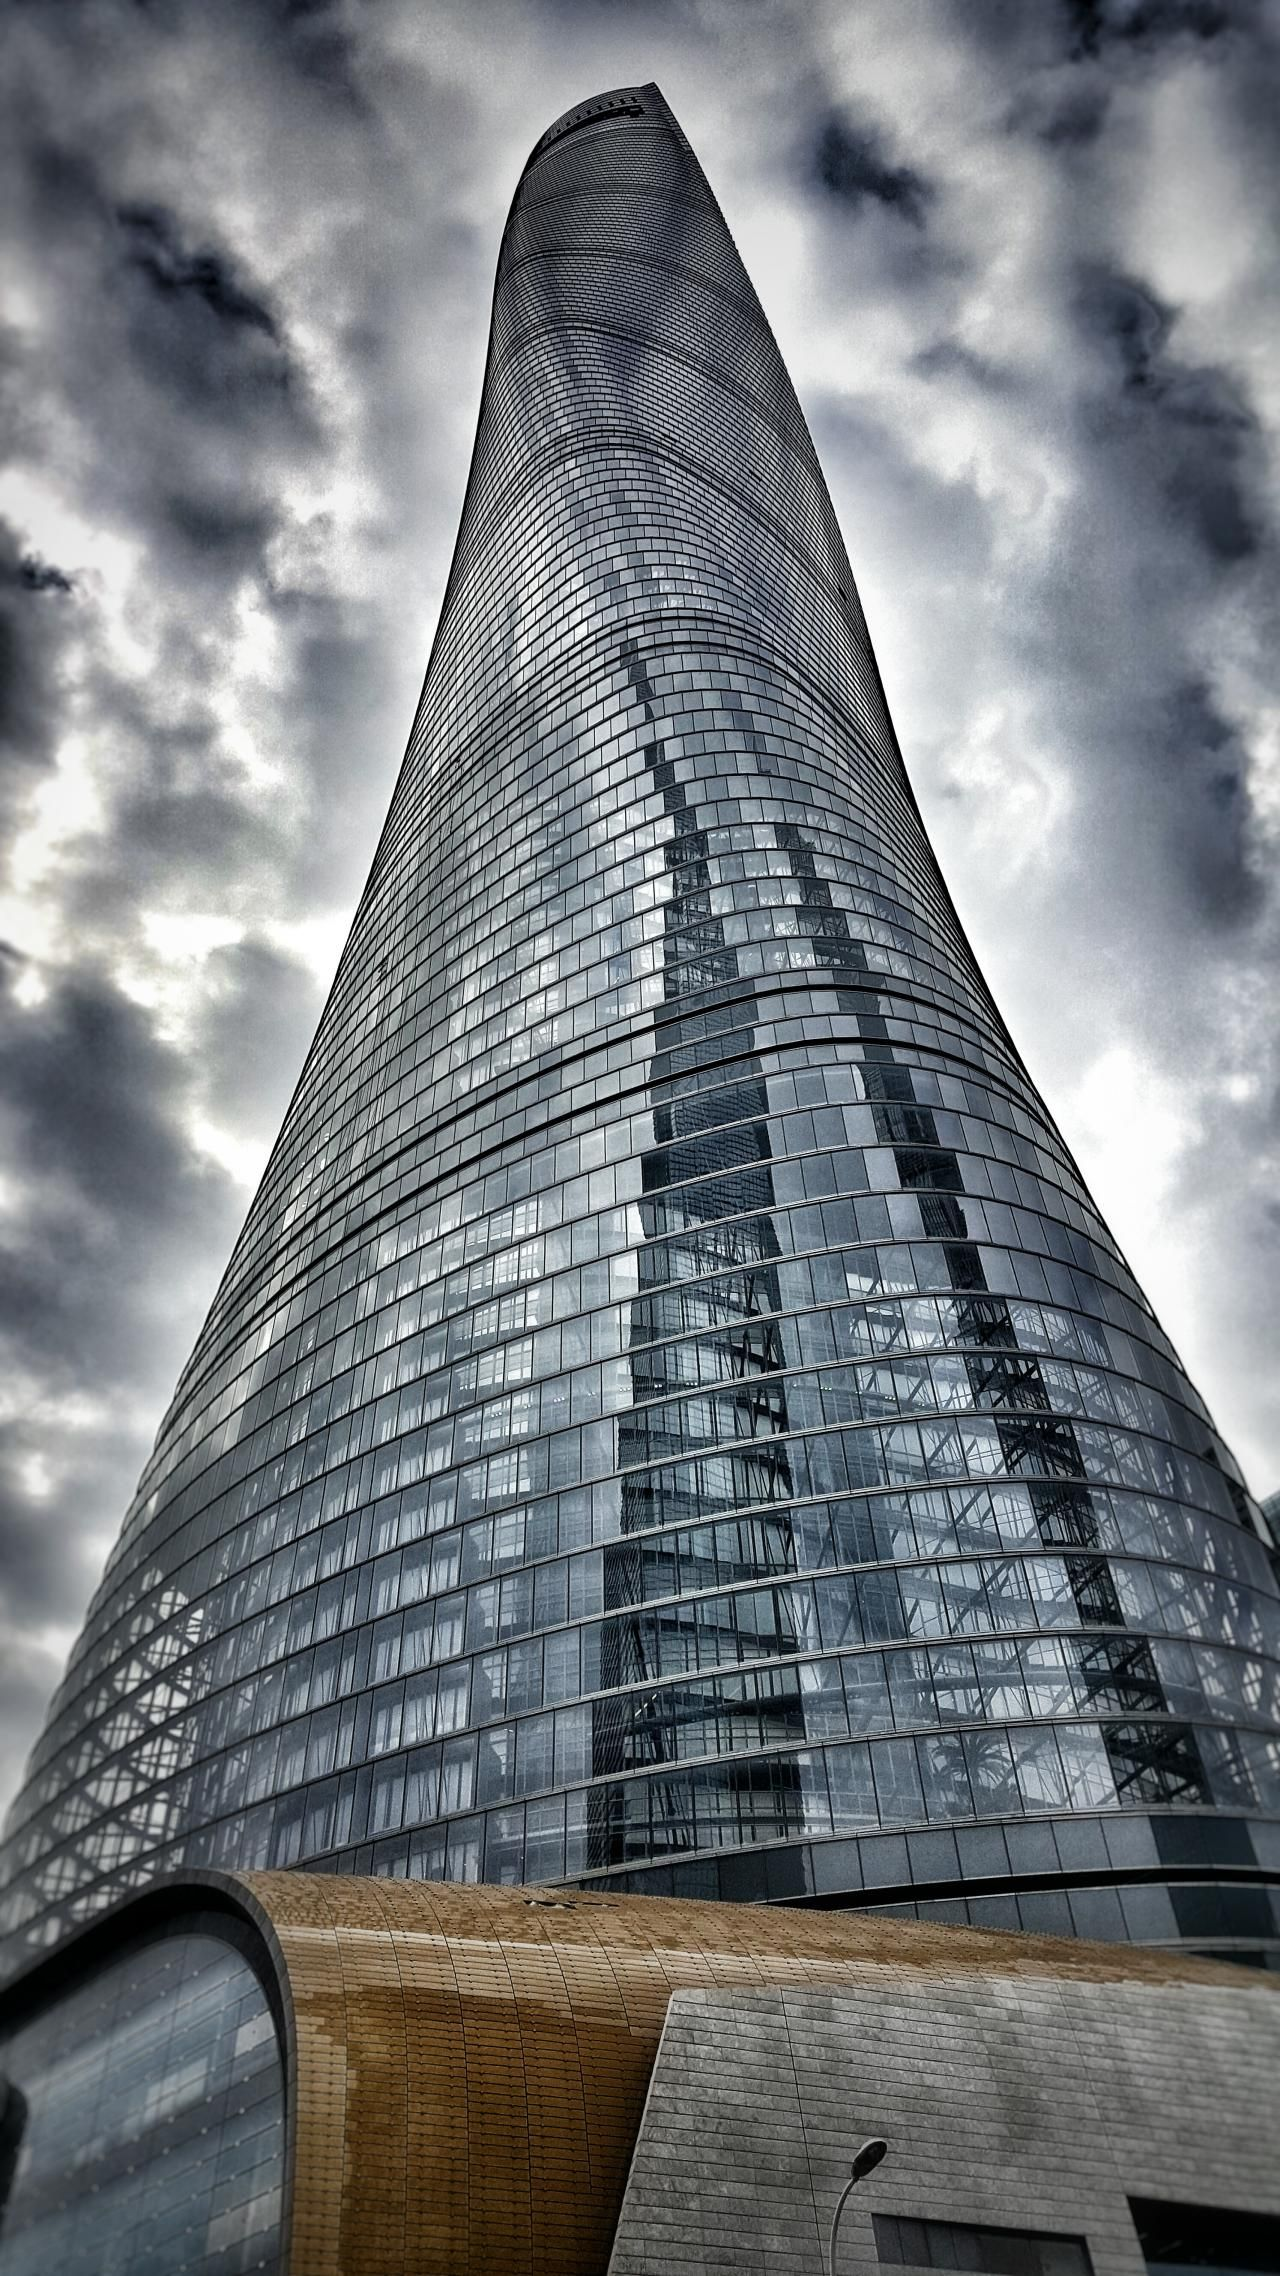 SHANGHAI   Shanghai Tower   632m   2073ft   128 fl   Com - Page 1150 - SkyscraperCity